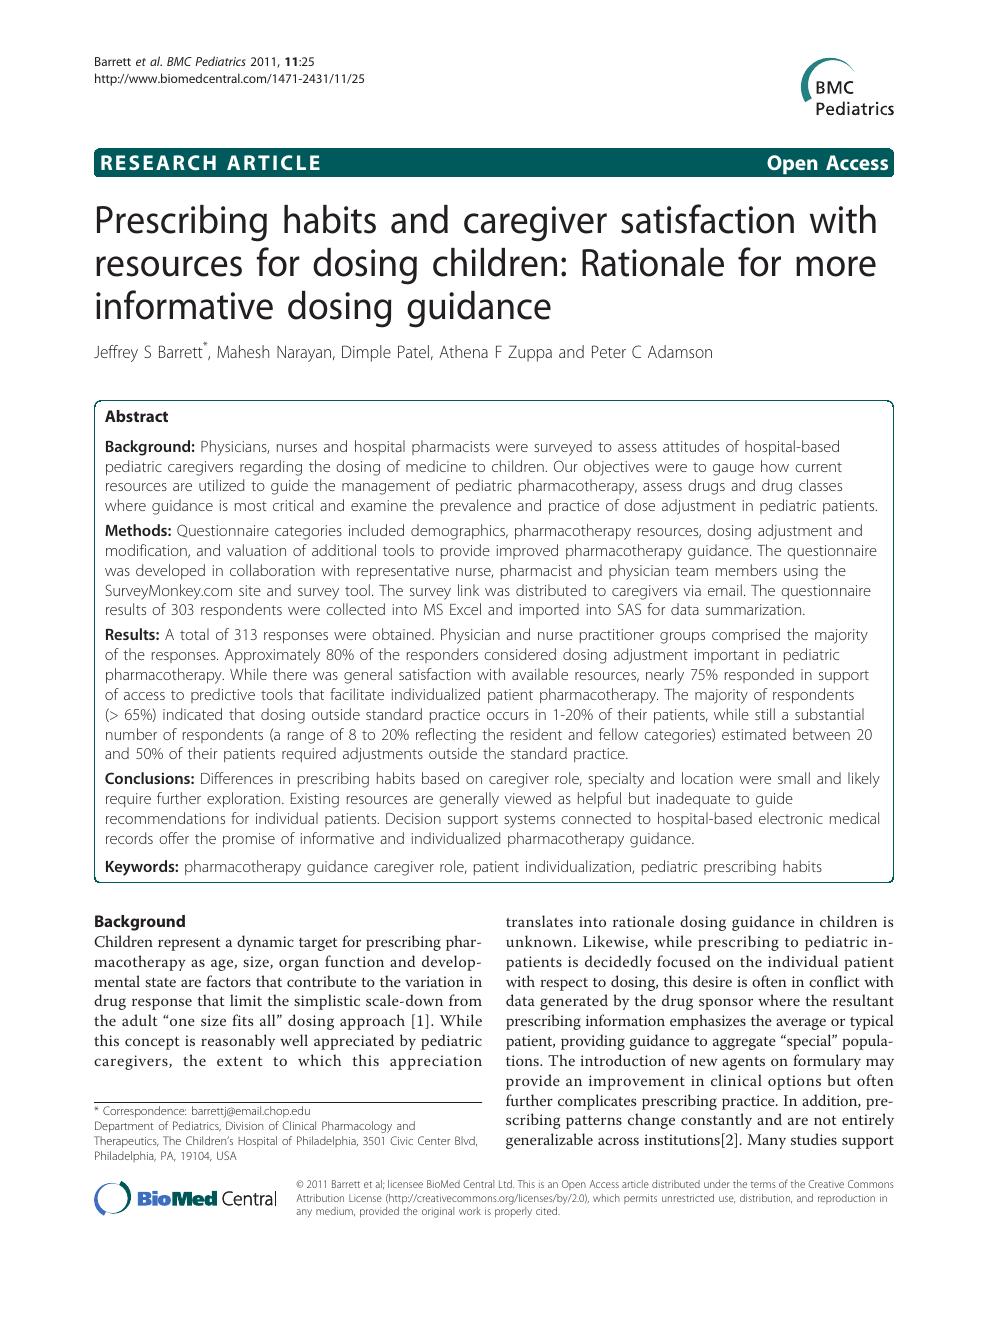 Prescribing habits and caregiver satisfaction with resources